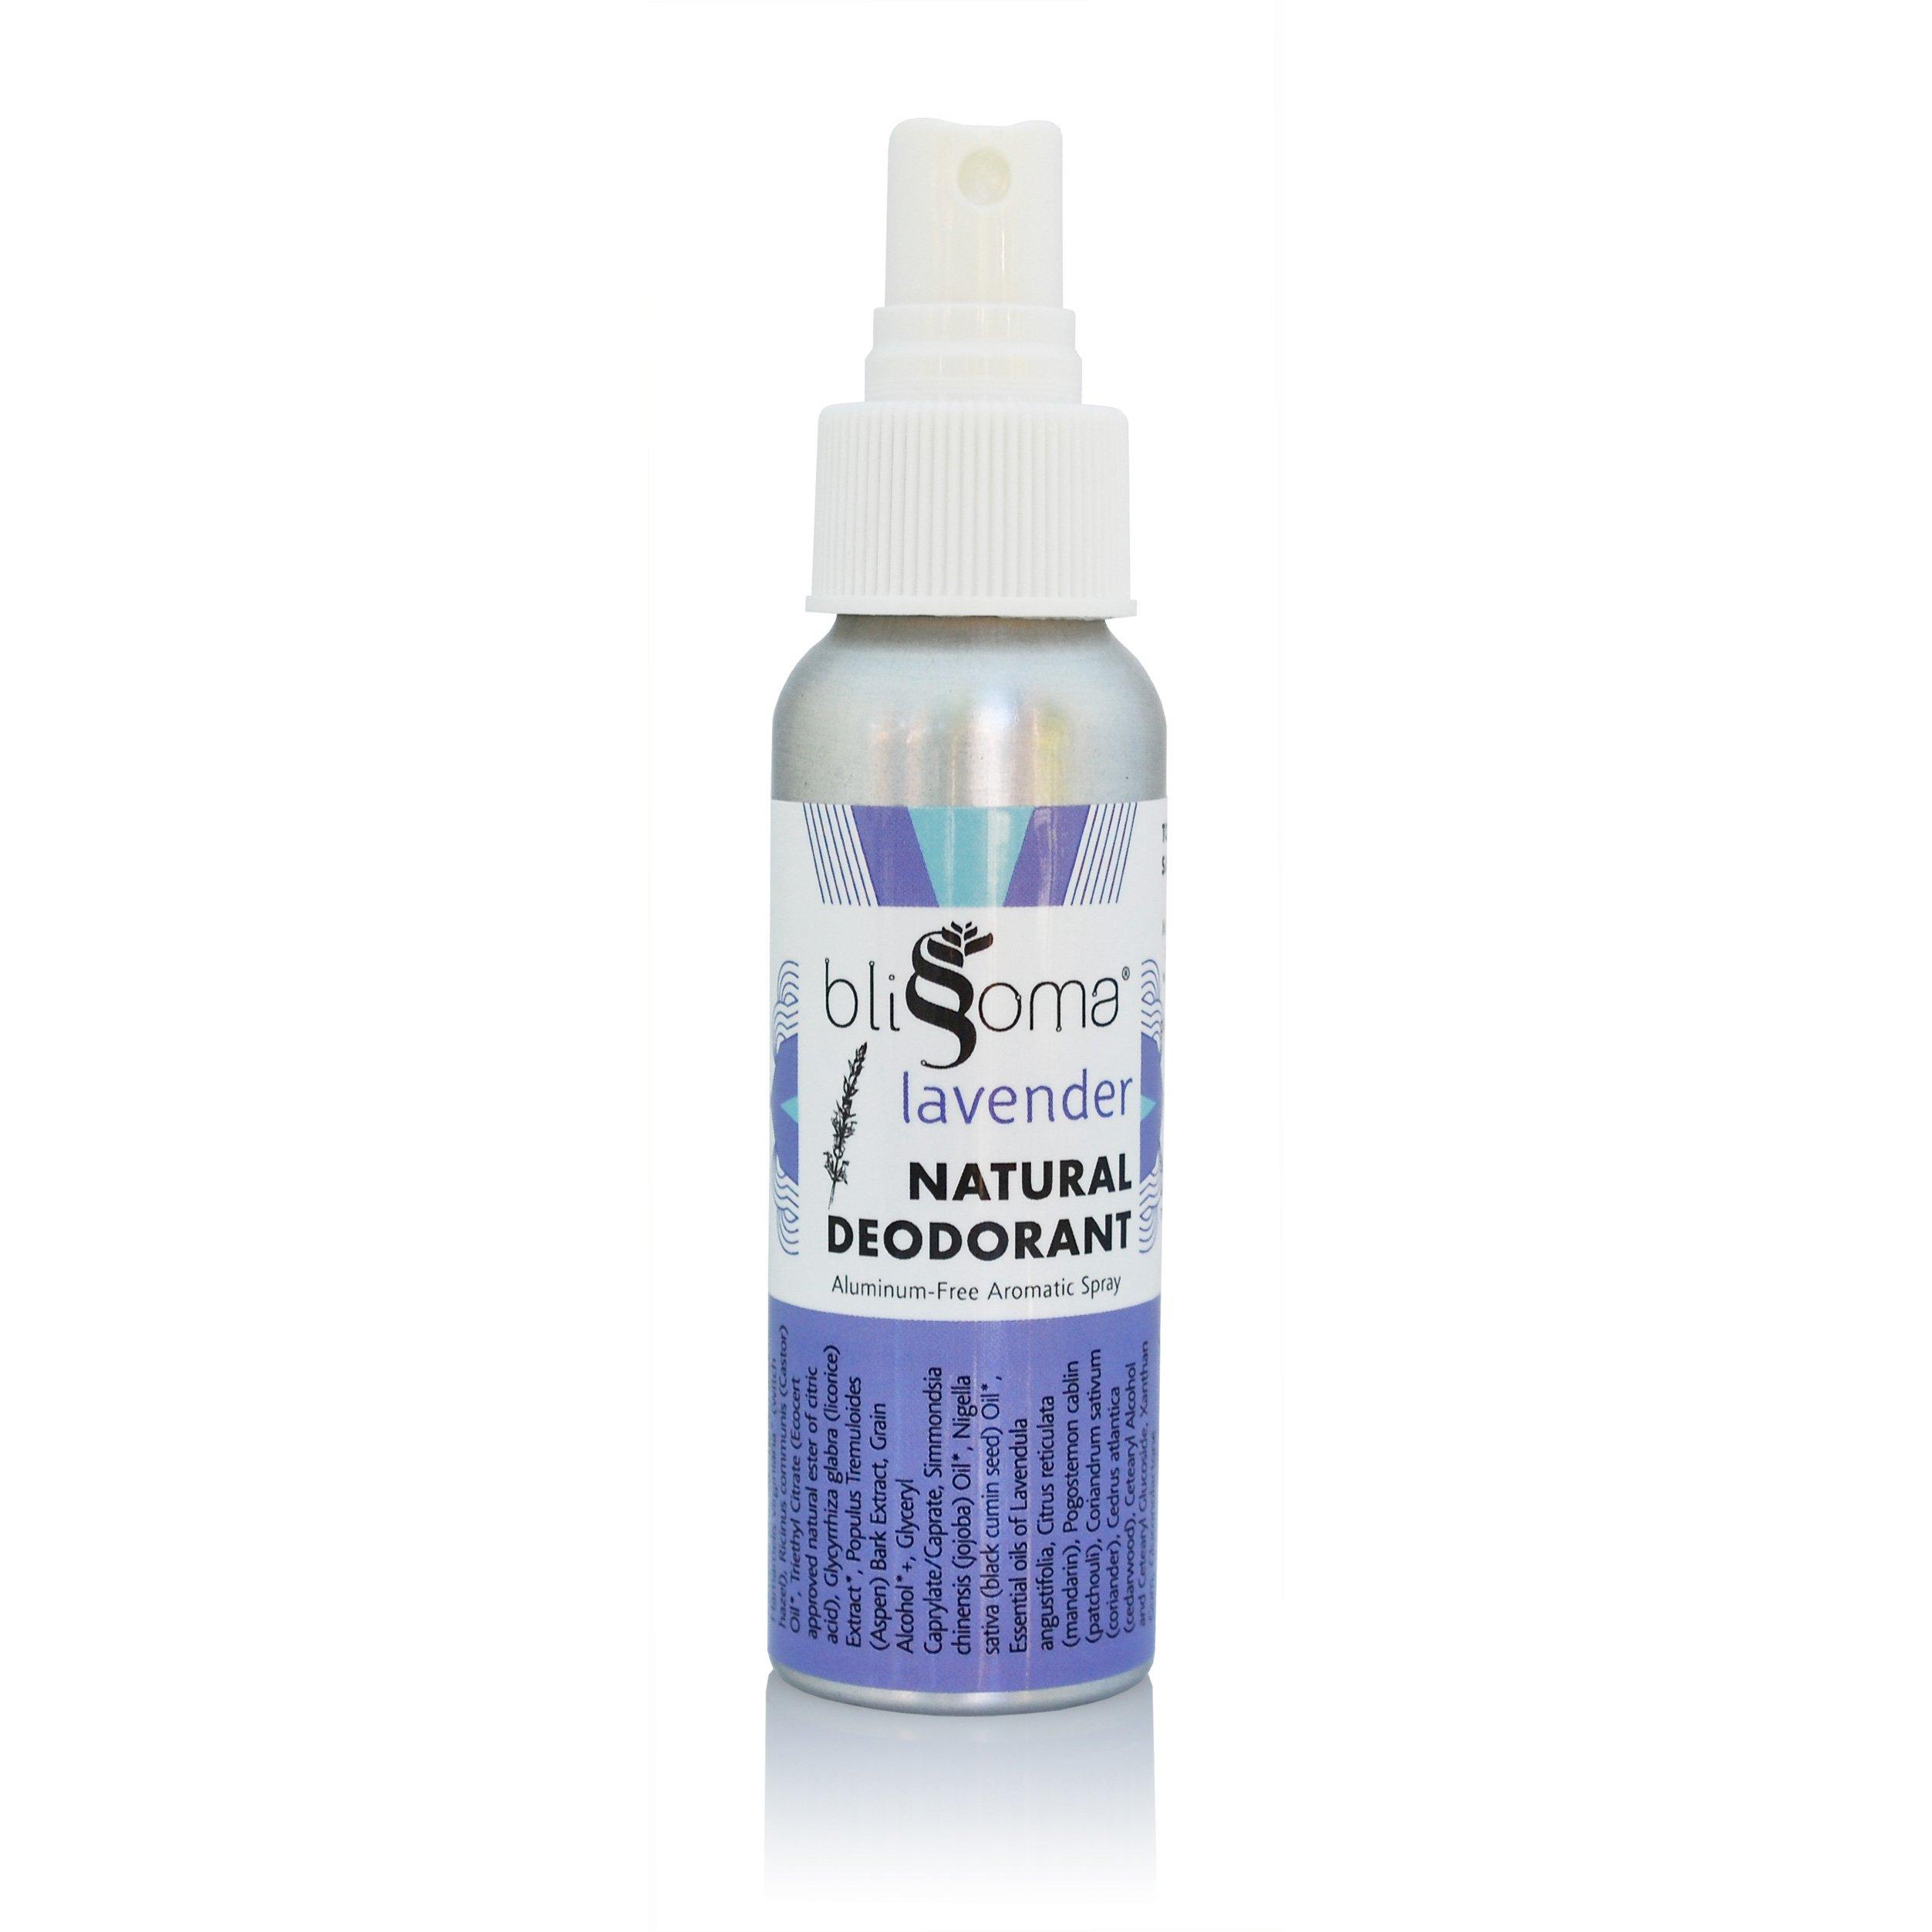 Lavender Natural Deodorant - Aromatic Spray with No Aluminum, No Toxins